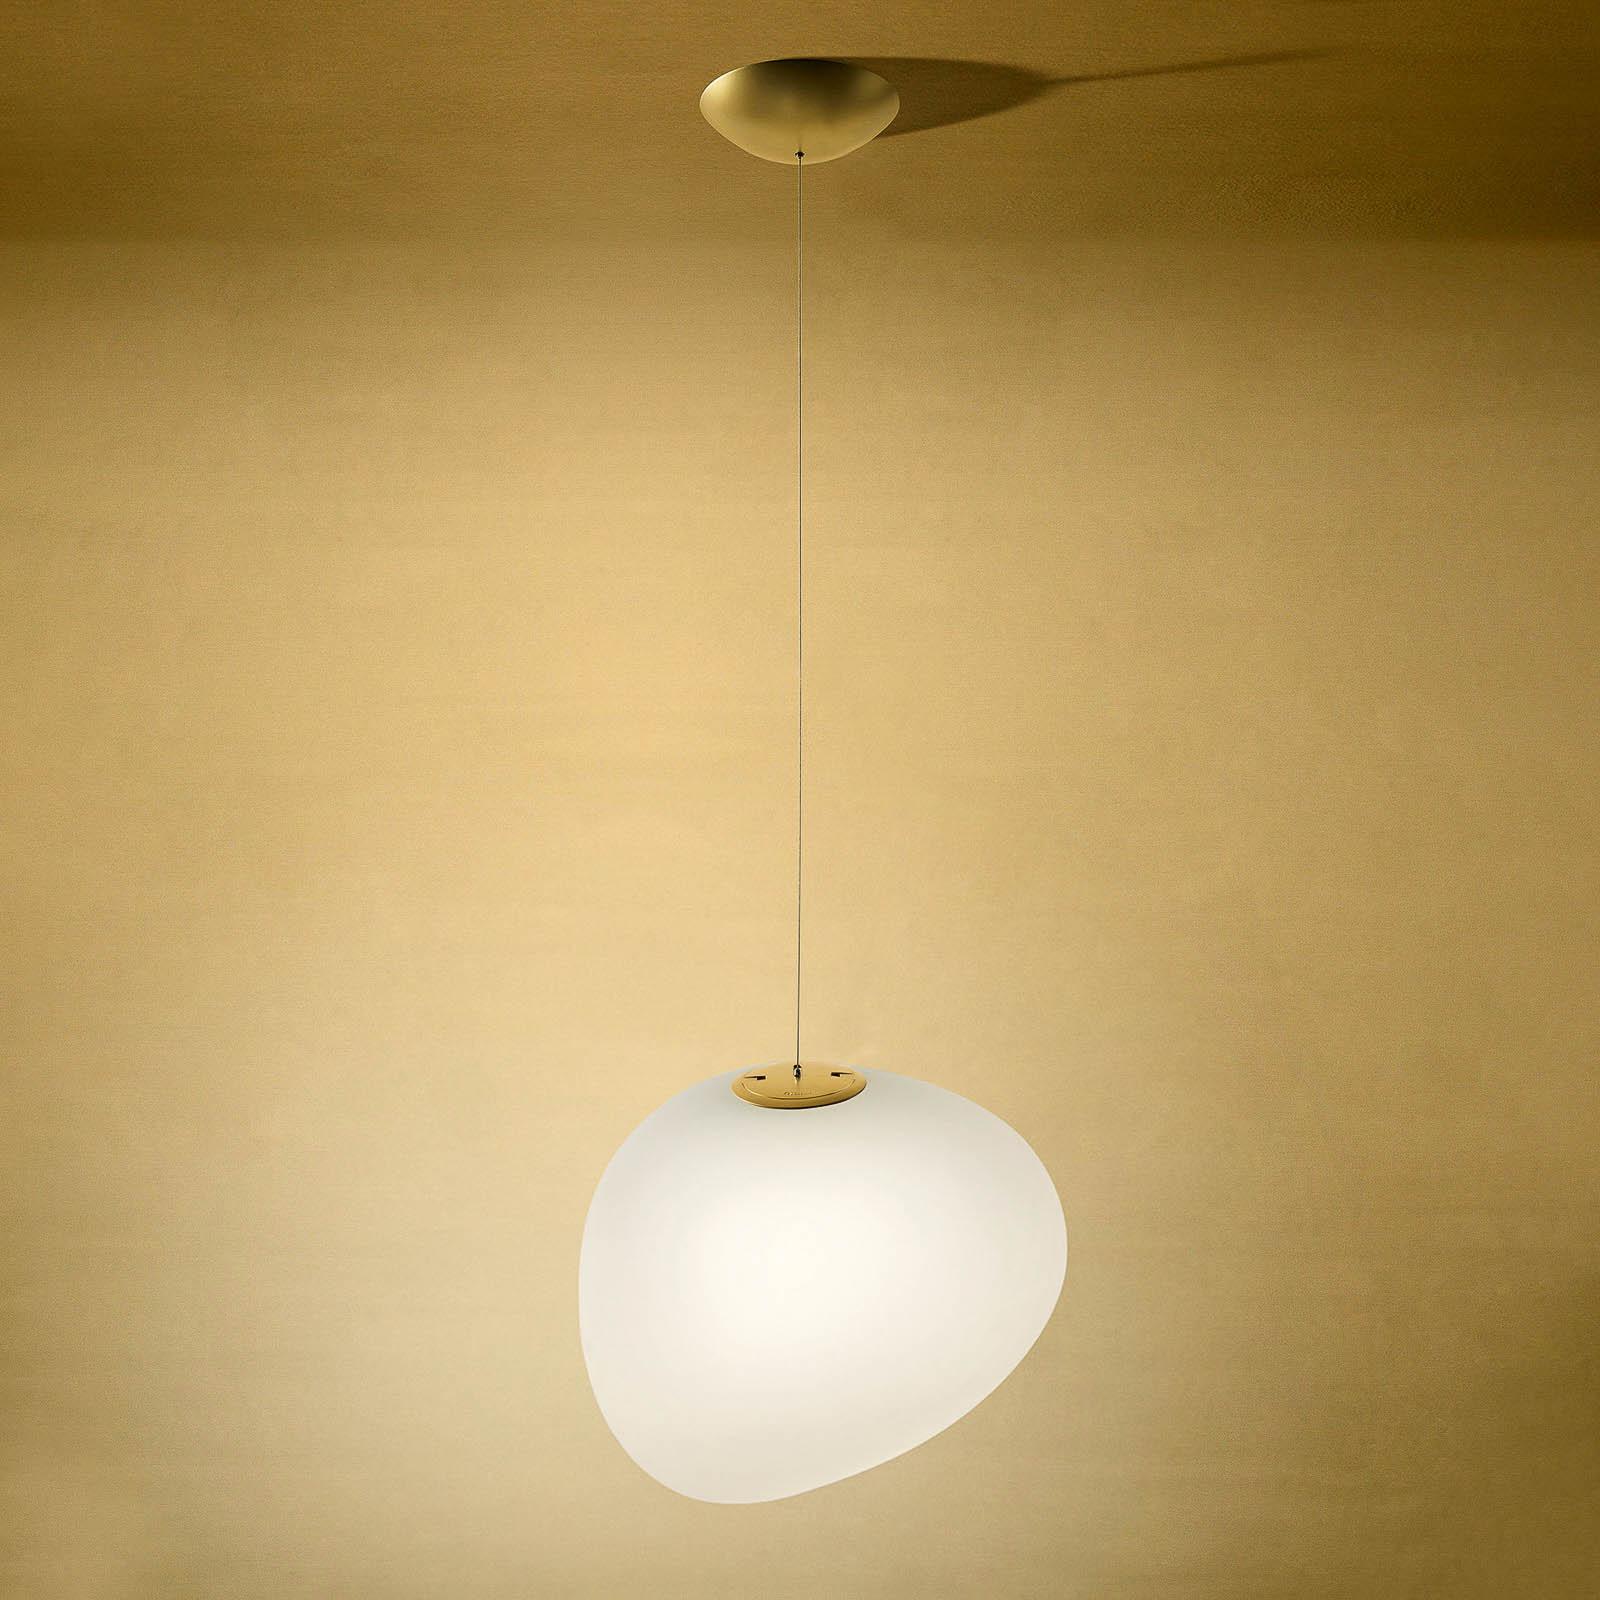 Foscarini Gregg piccola hængelampe, gylden